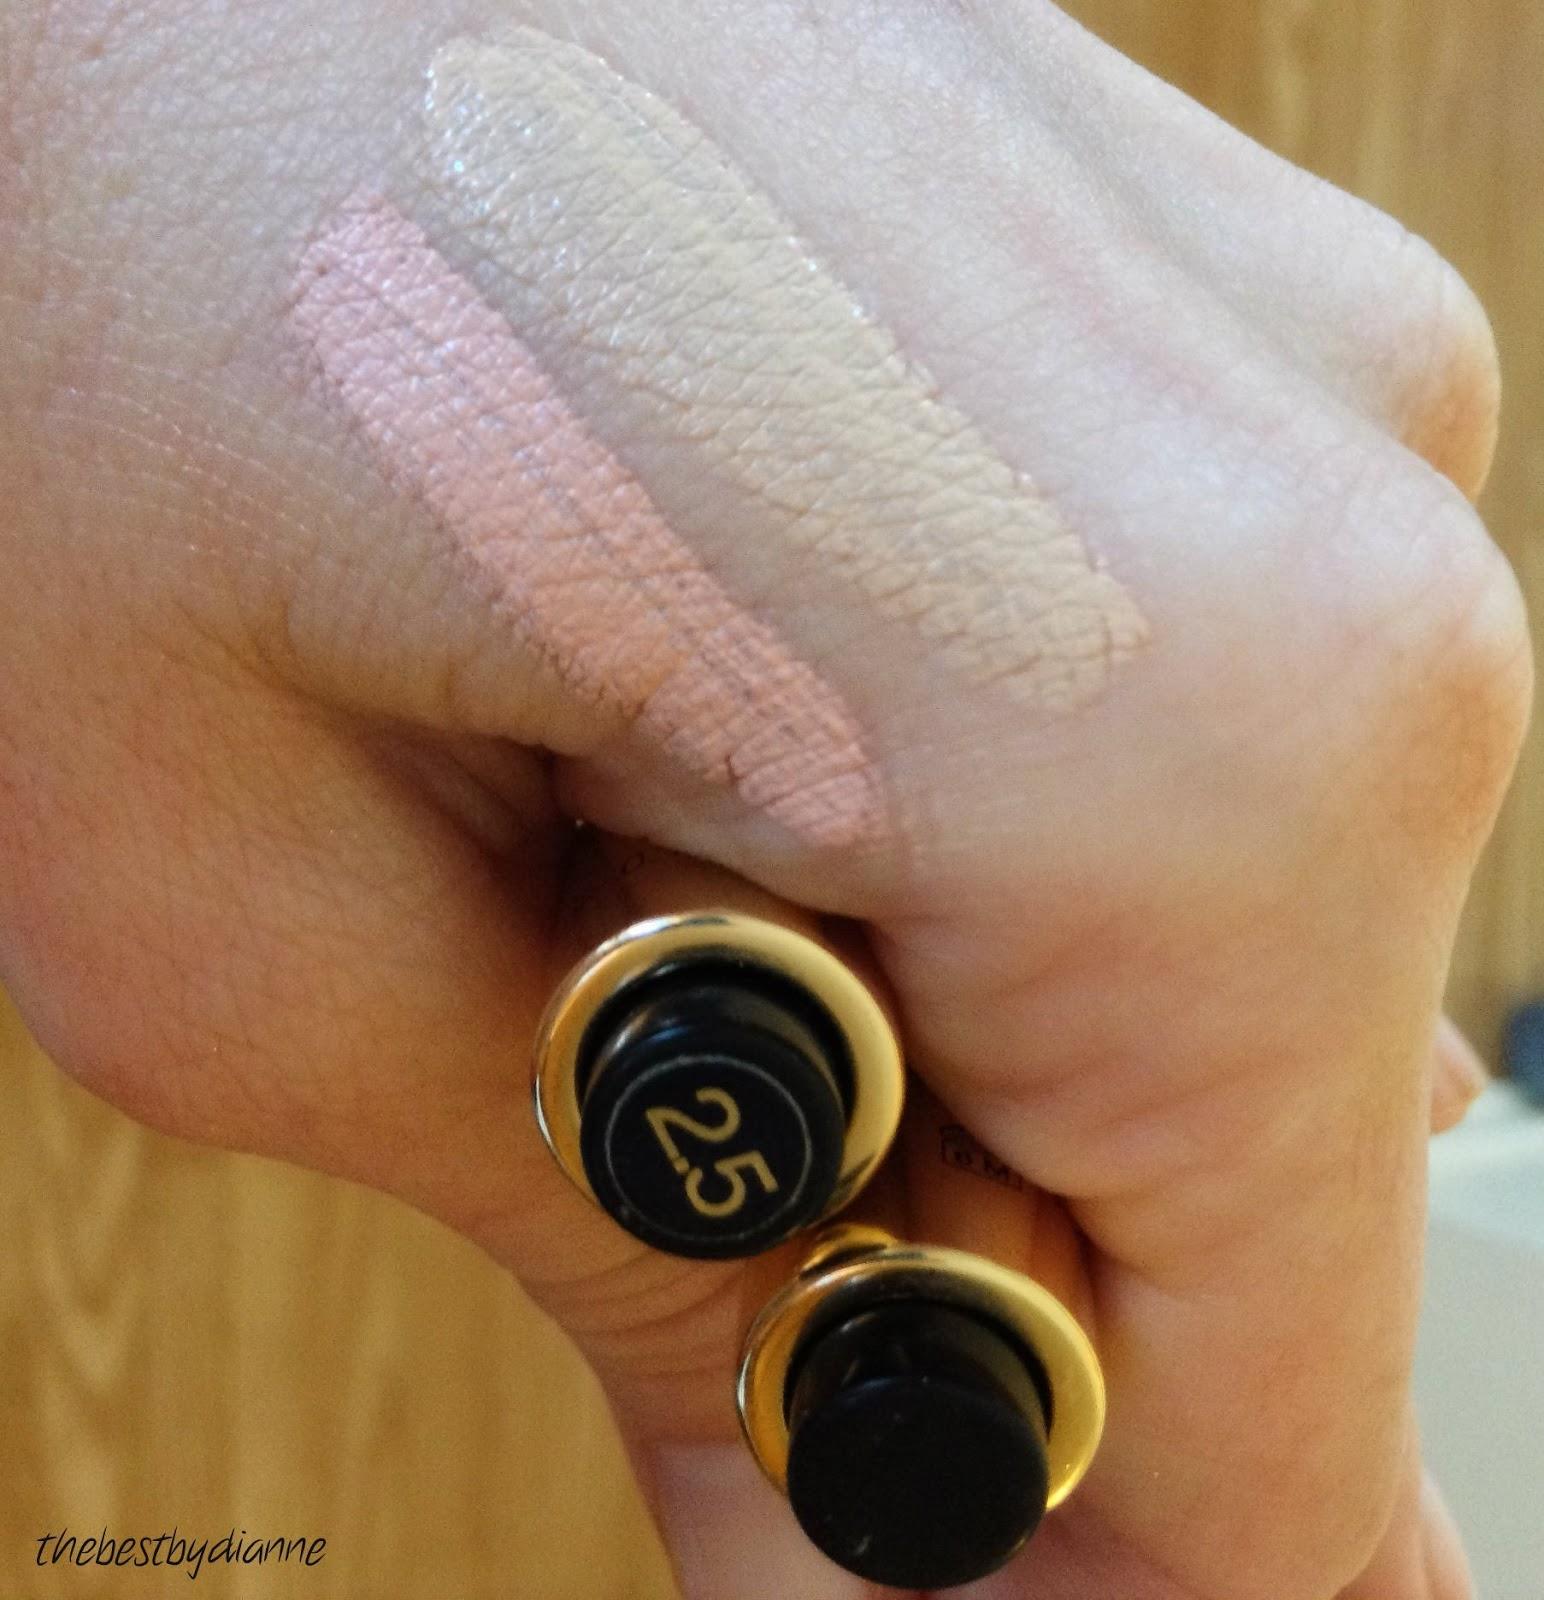 Touche Éclat Face Highlighter Pen by YSL Beauty #16